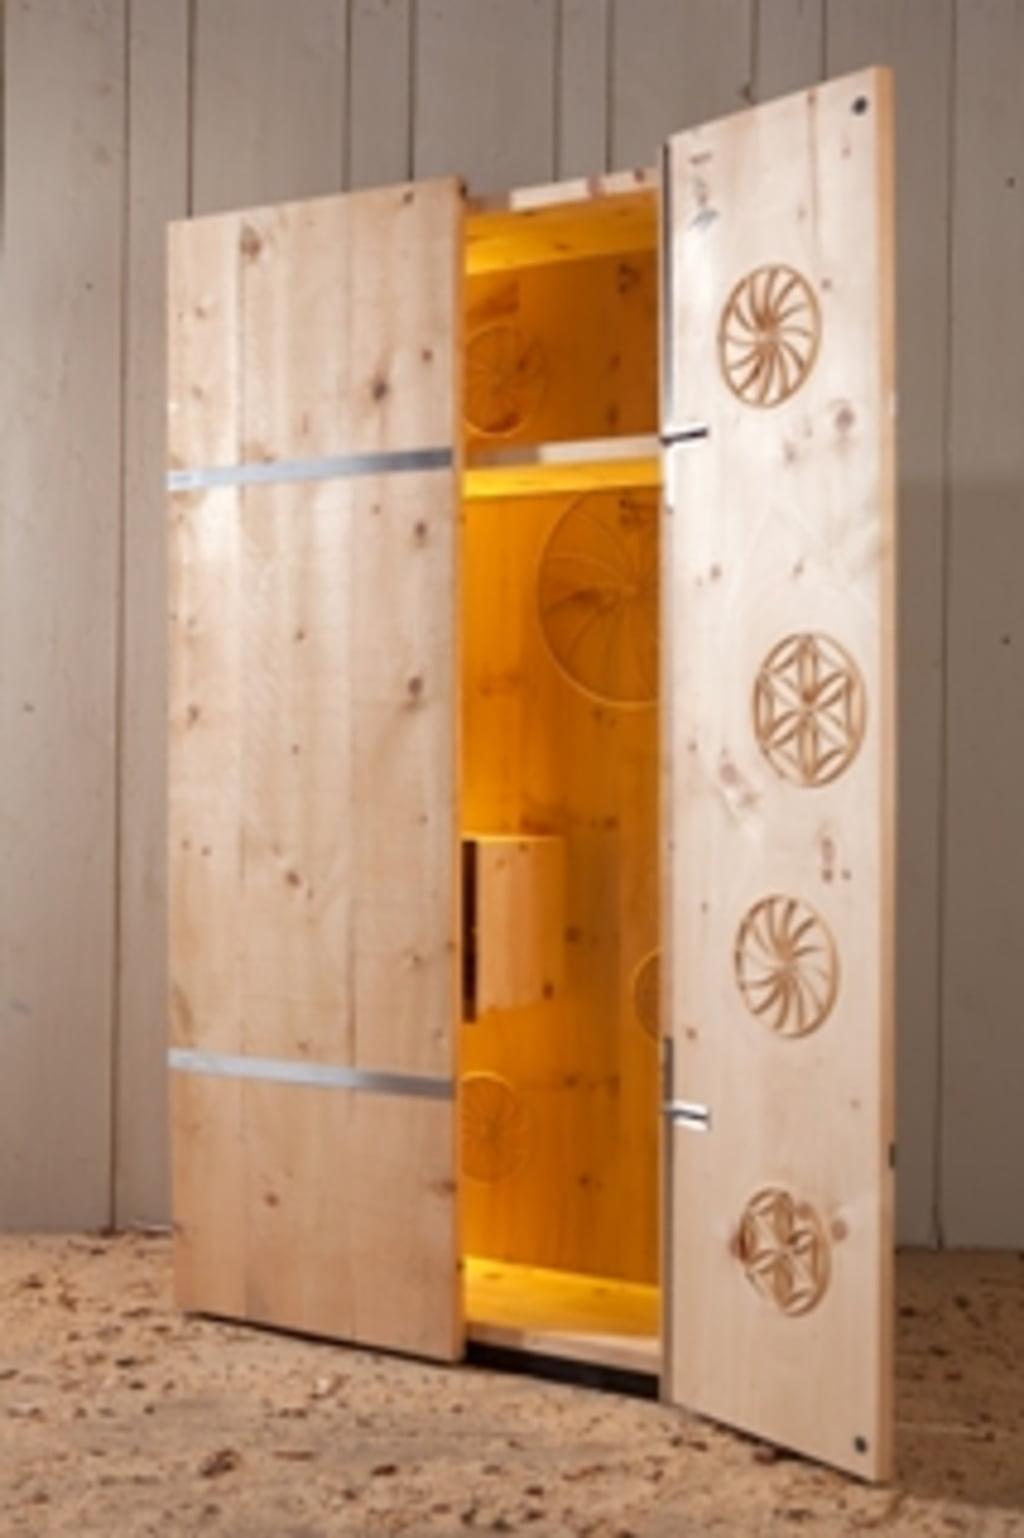 m belwerkstatt ramon zangger samedan winter in engadin st moritz. Black Bedroom Furniture Sets. Home Design Ideas